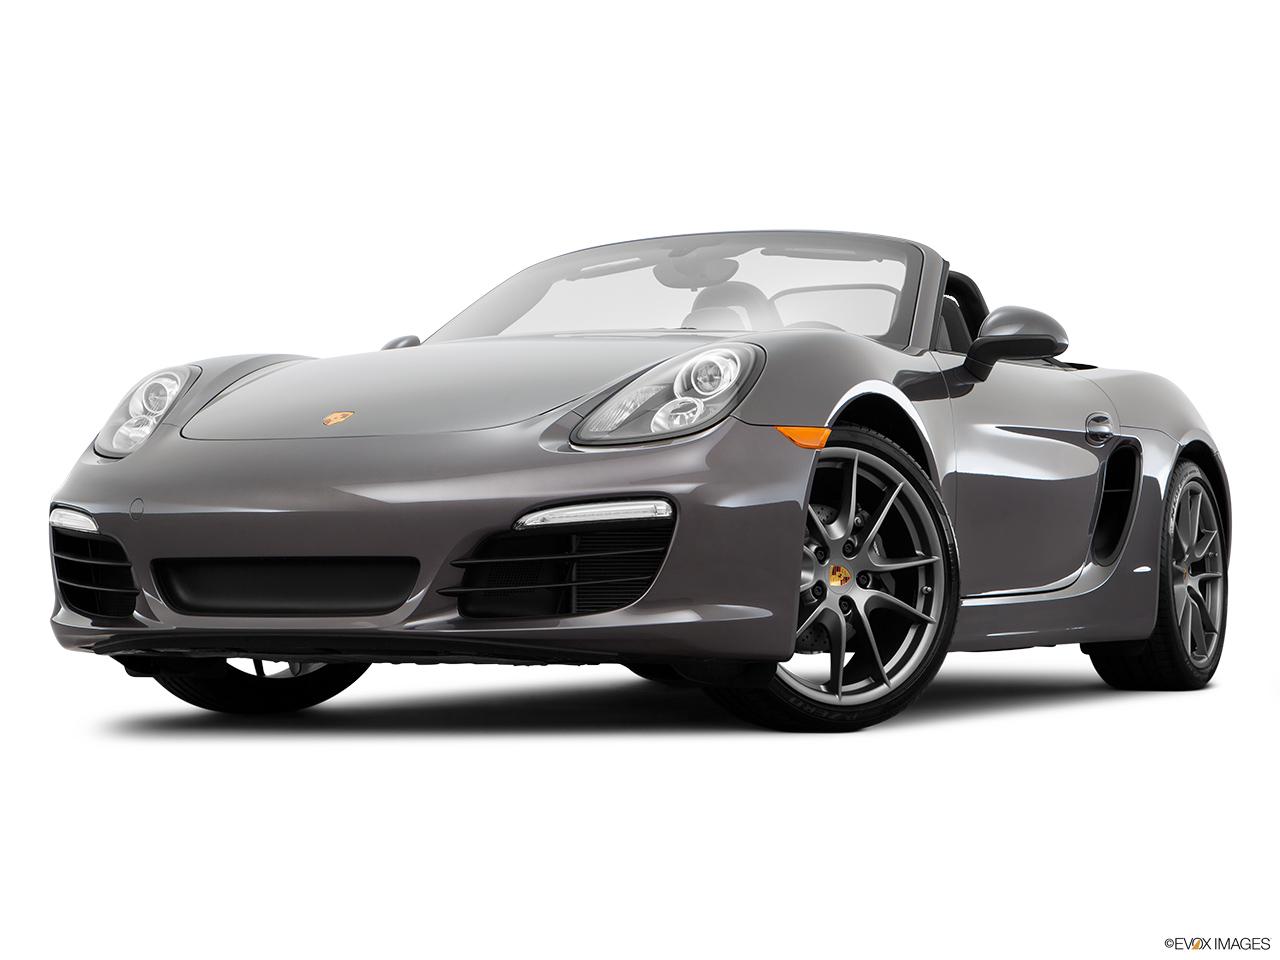 2016 Porsche Boxster Prices In Bahrain Gulf Specs